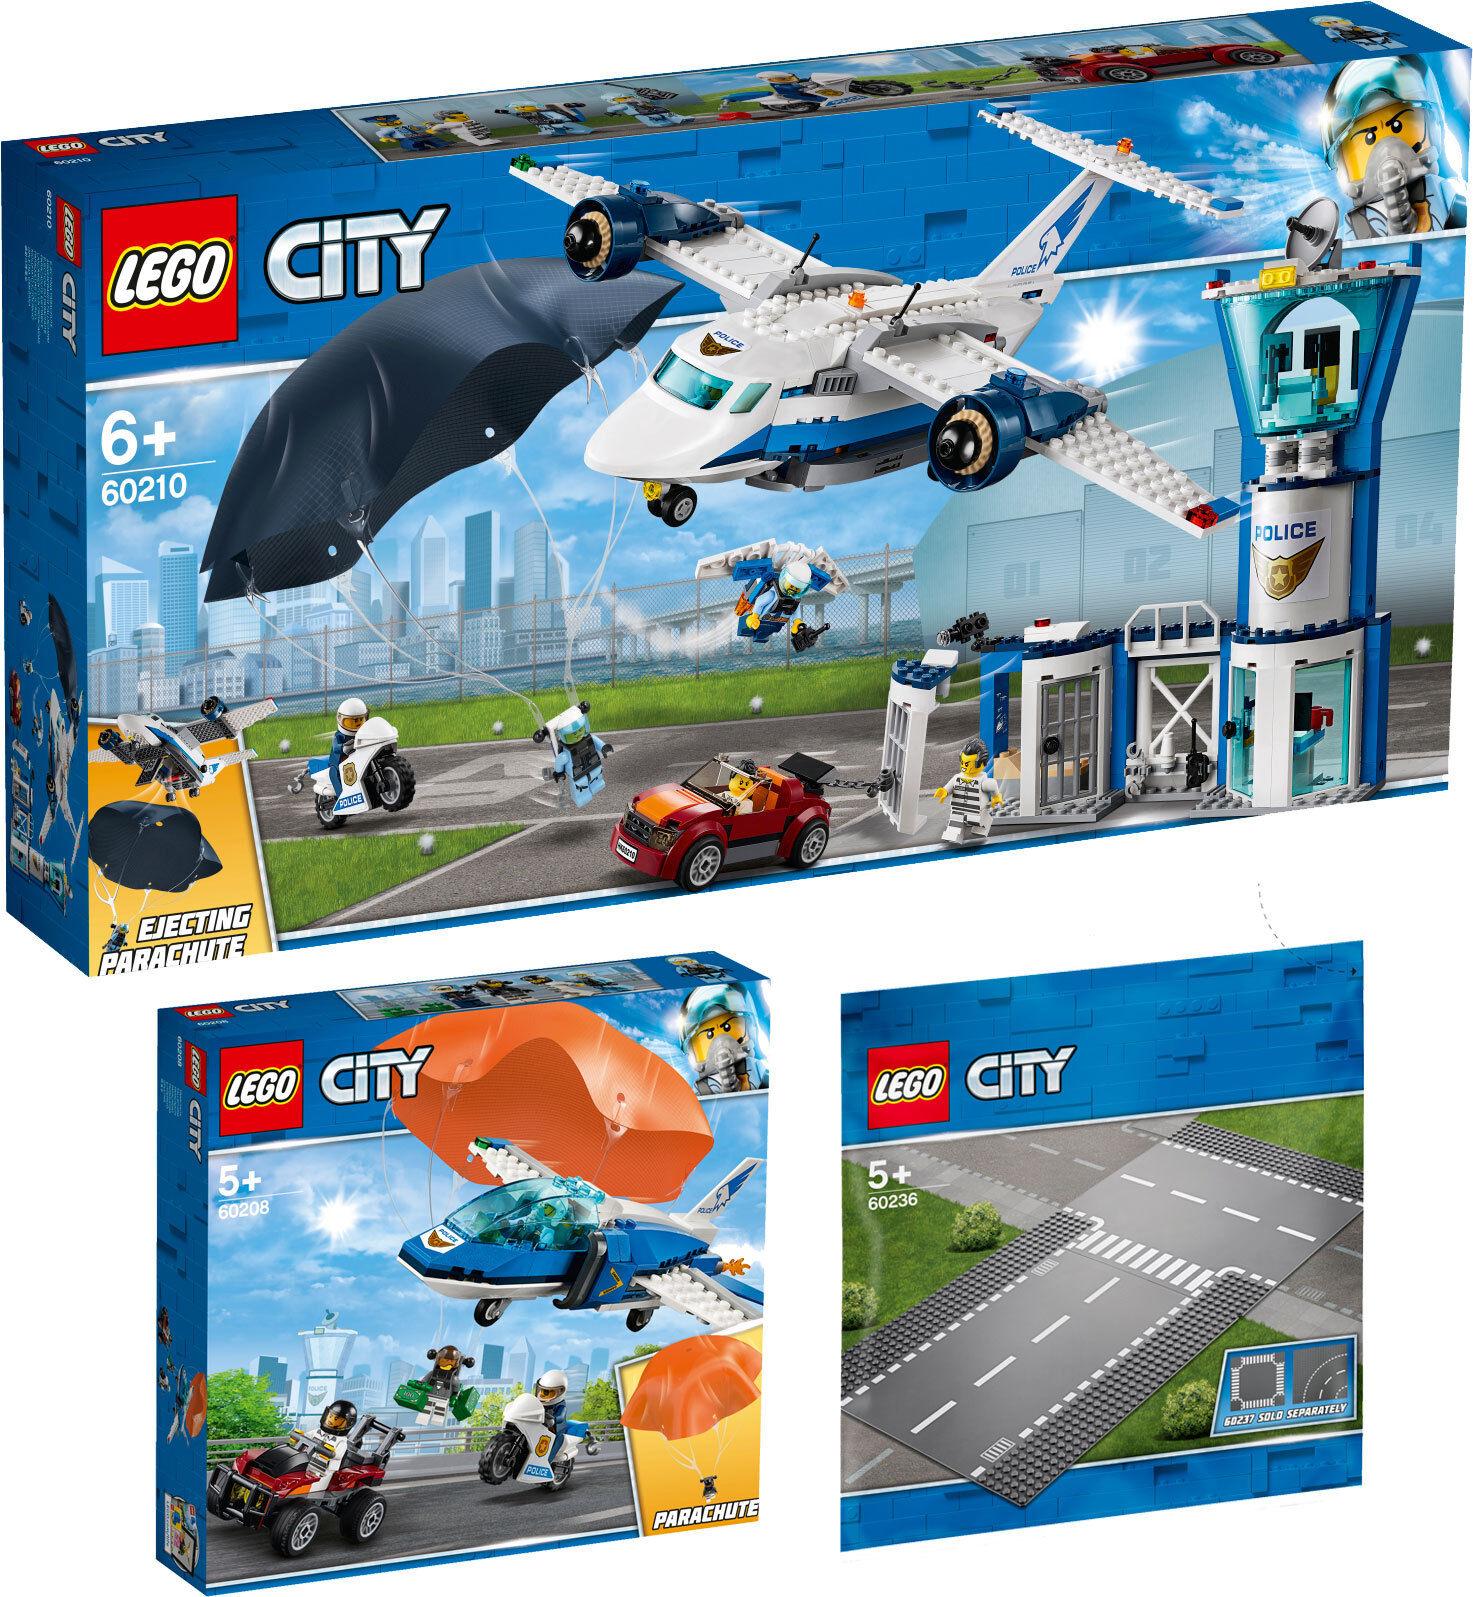 LEGO CITY POLIZIA base da aviatore 60210 60208 60236 appena e T n1 19